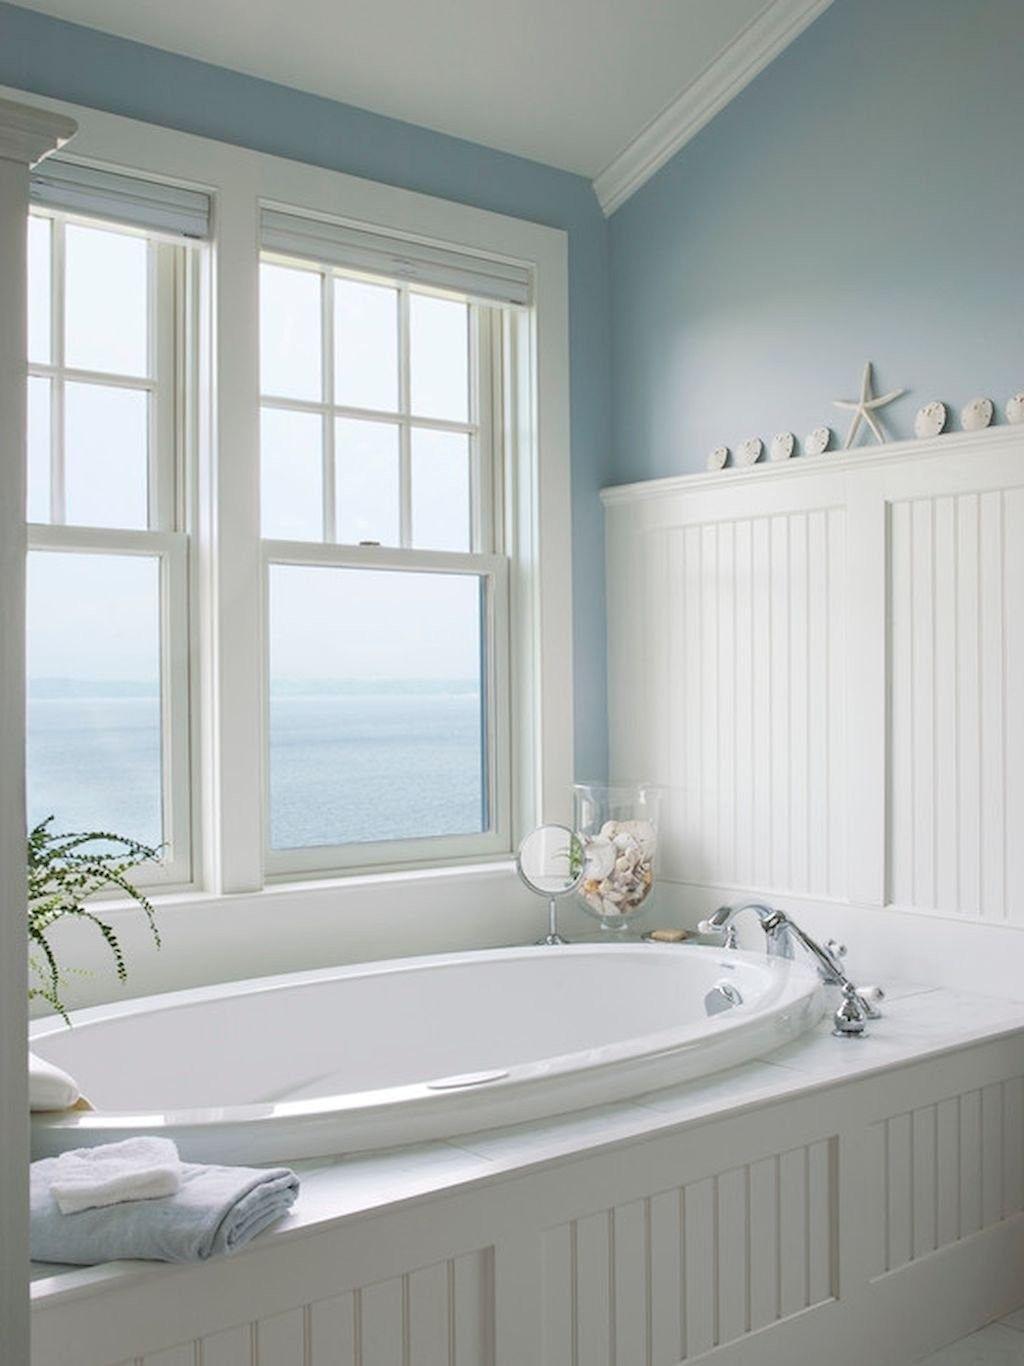 Nice Nautical Home Decor Ideas With Coastal Style 15